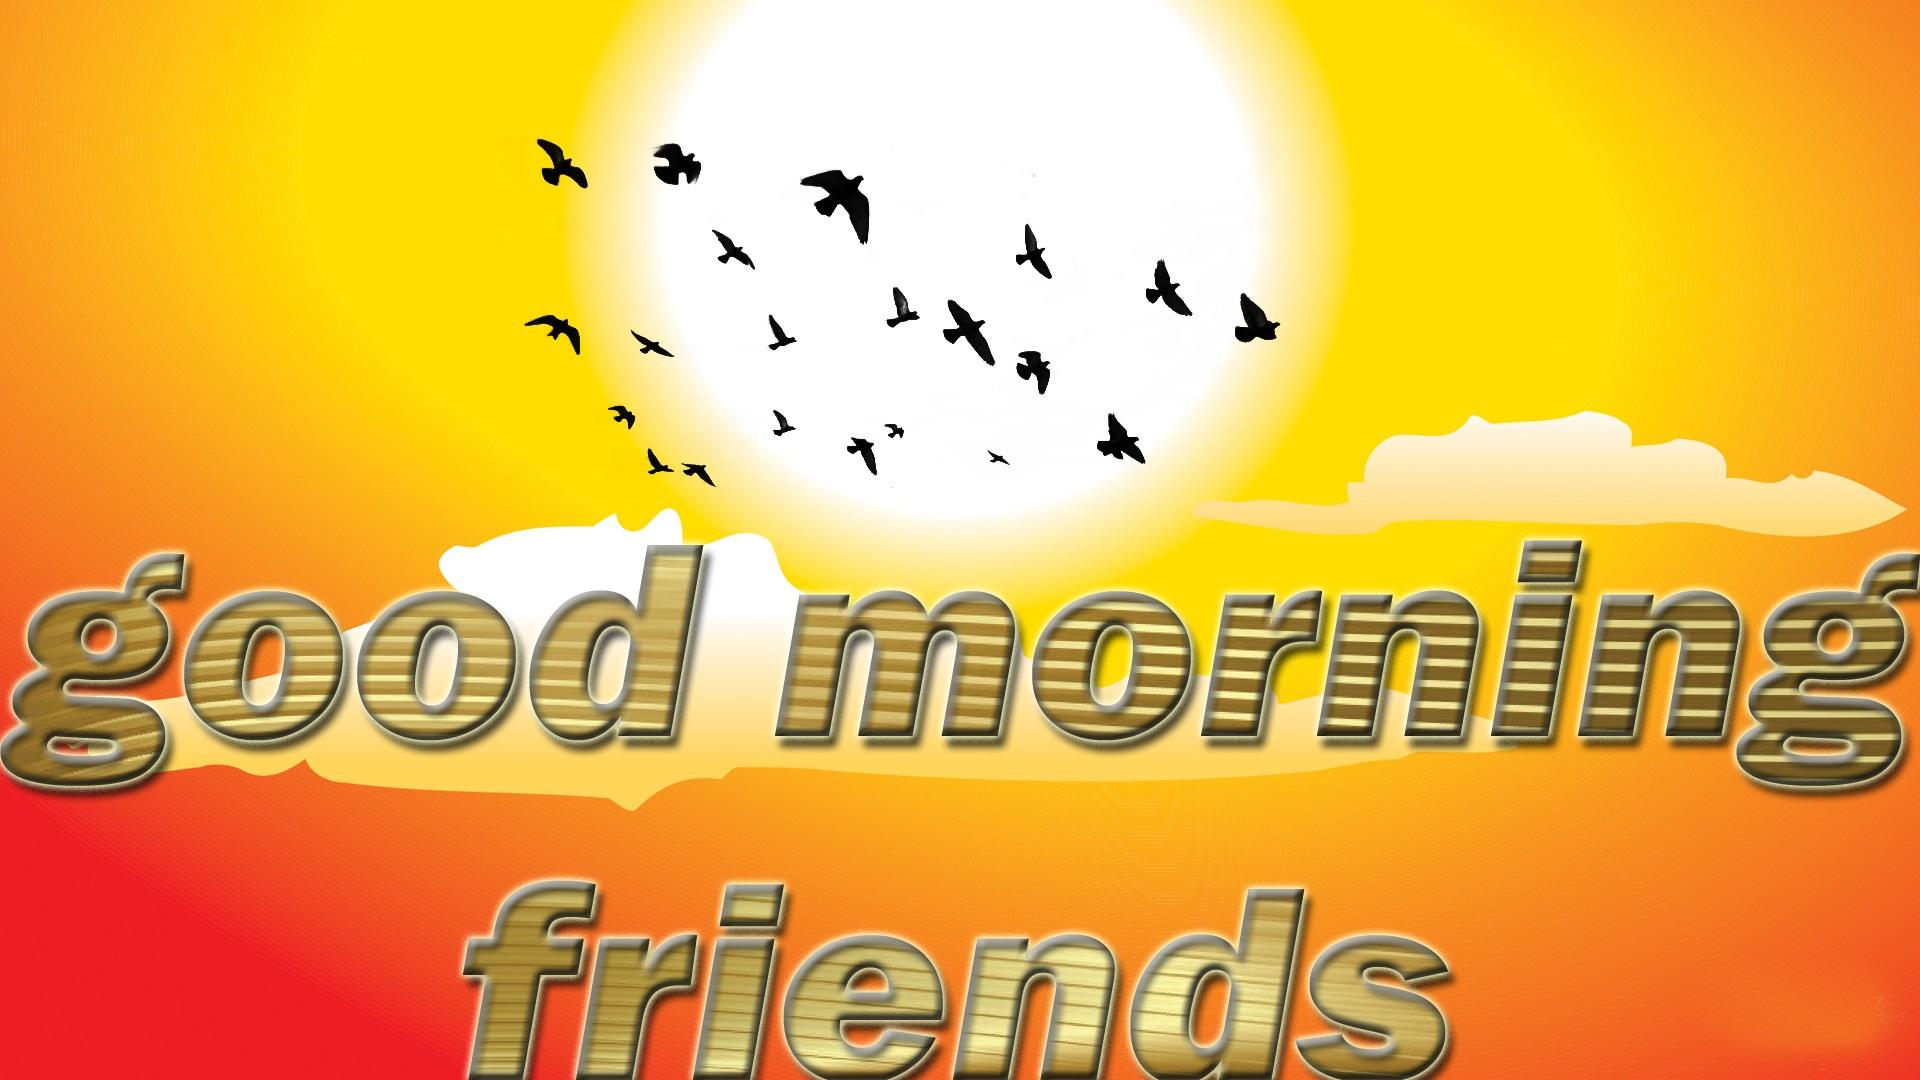 Good morning friends hd wallpaper download